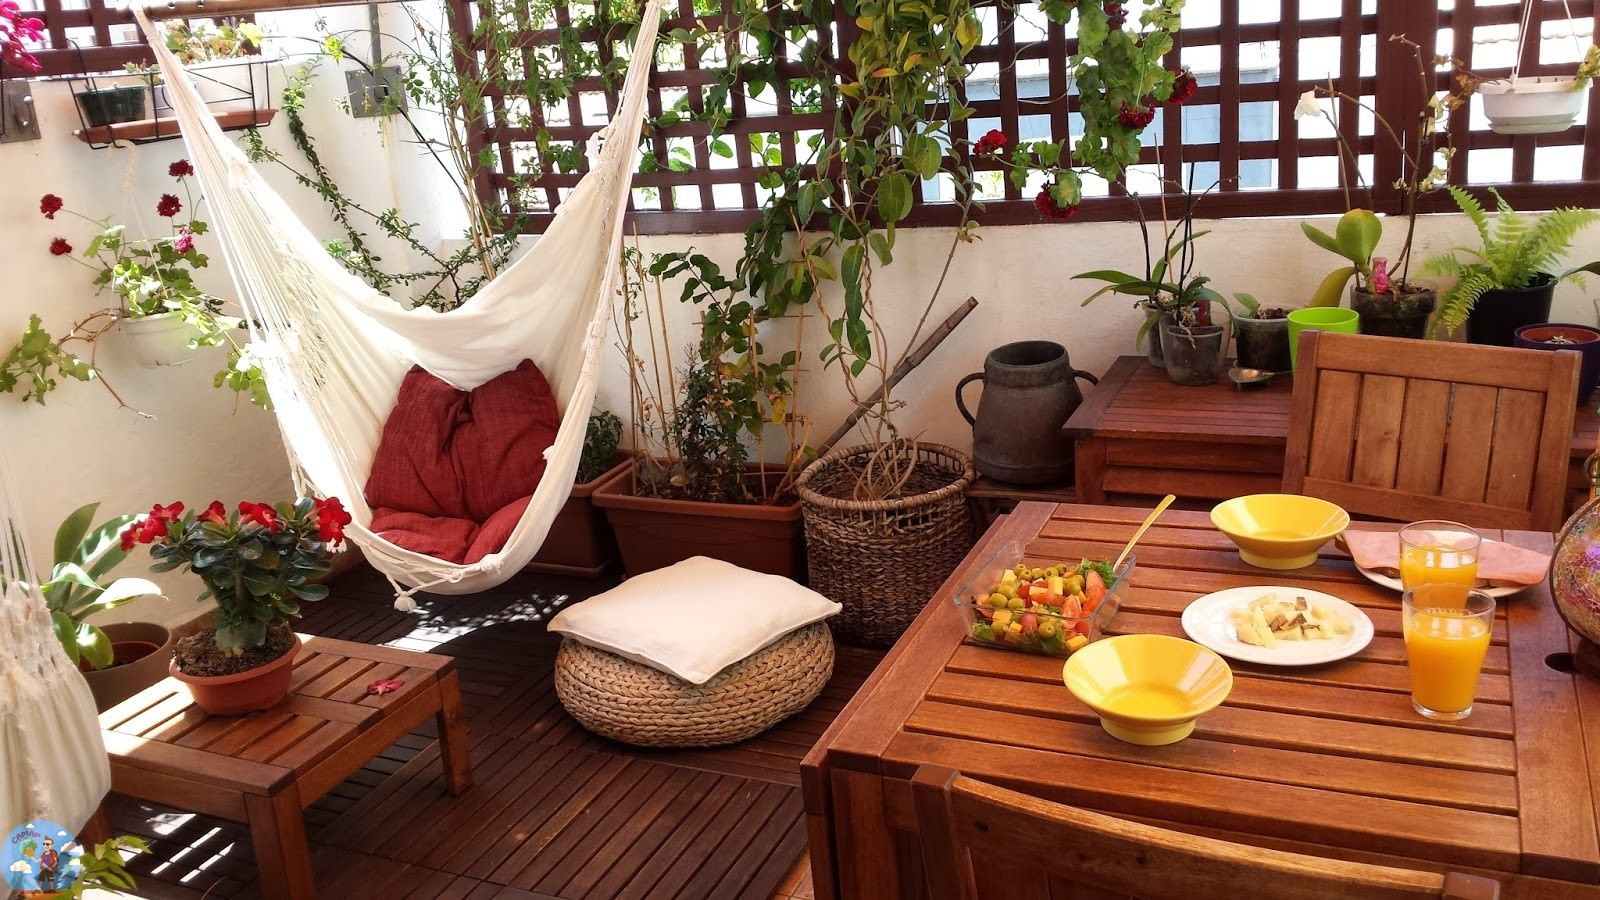 Уютный интерьер кафе